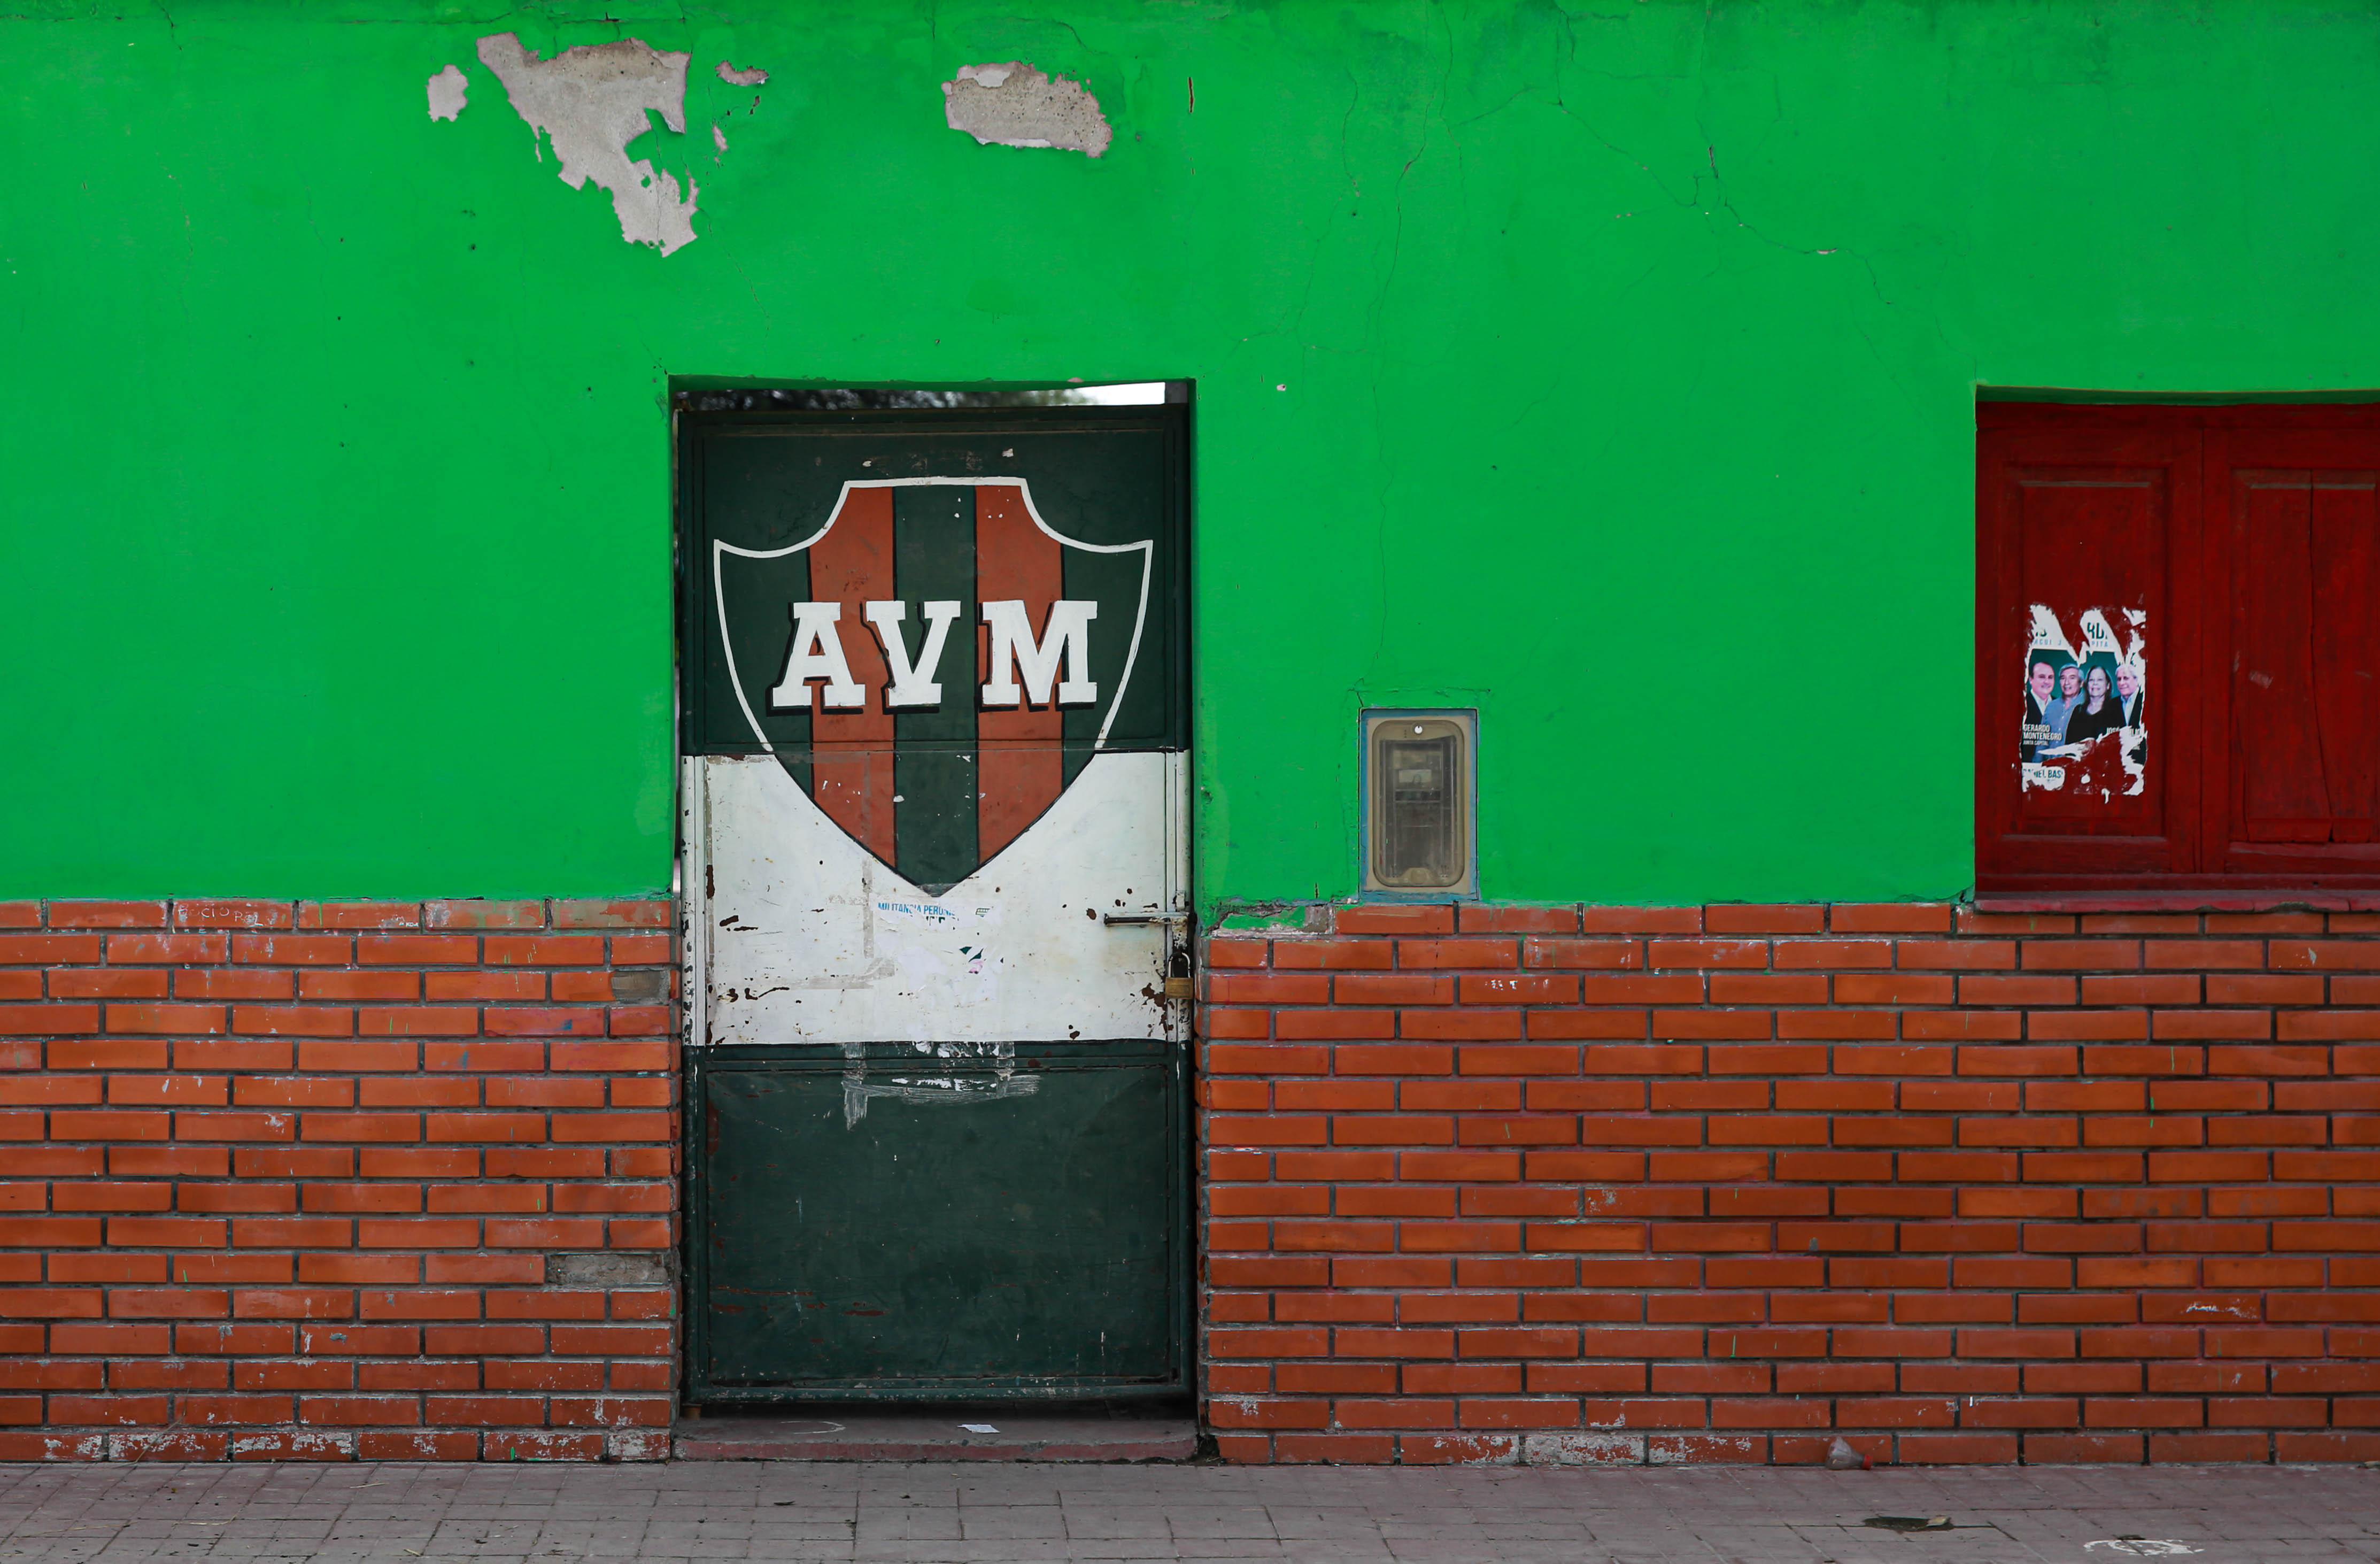 Club Villa Mercedes, ubicada enfrente de la casa de Koli Arce.